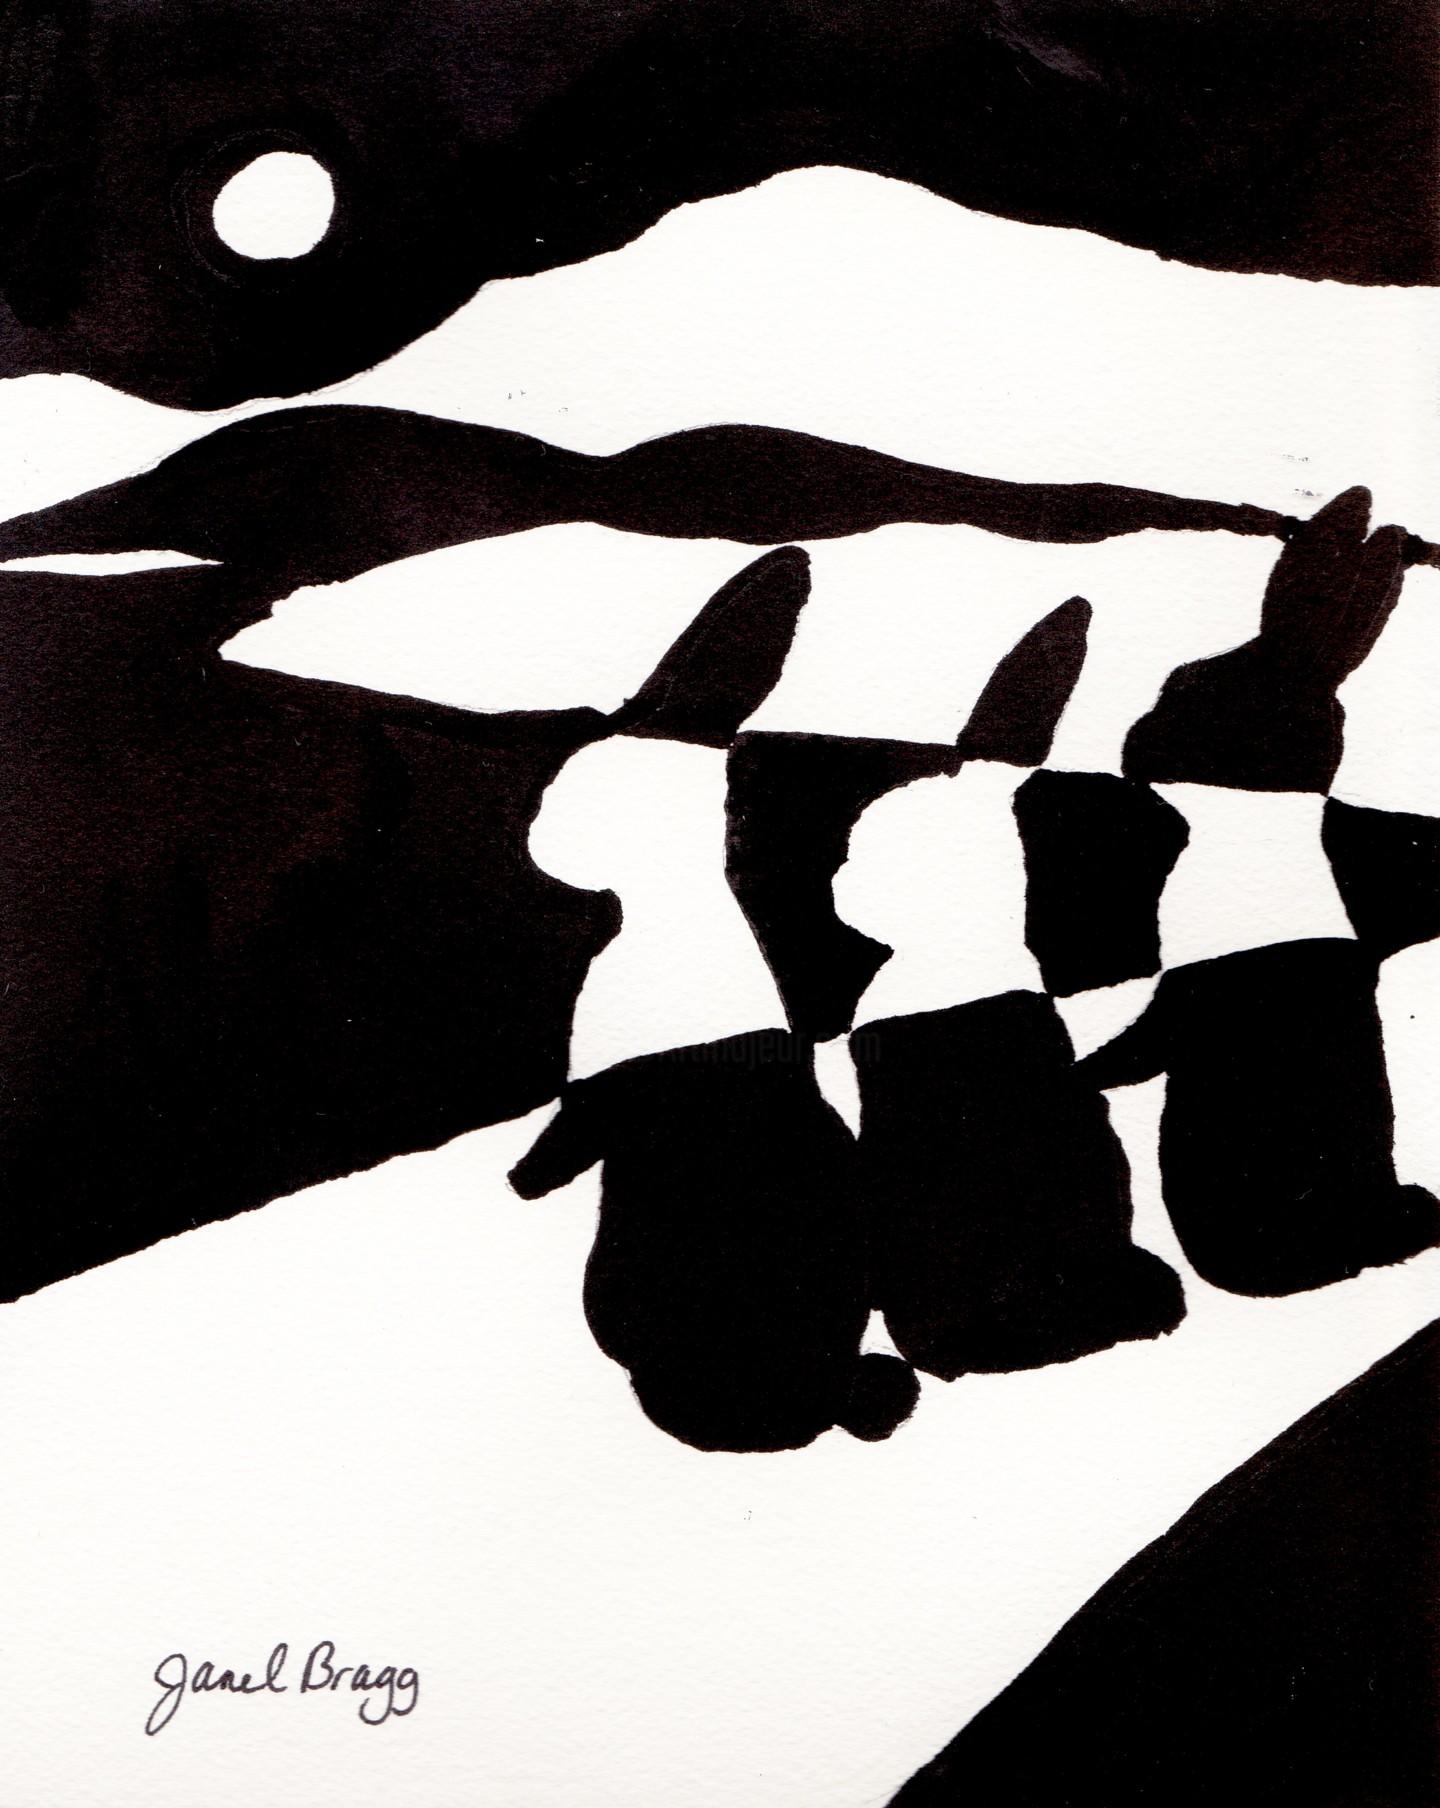 Janel Bragg - Rabbits at Night on Winding Road